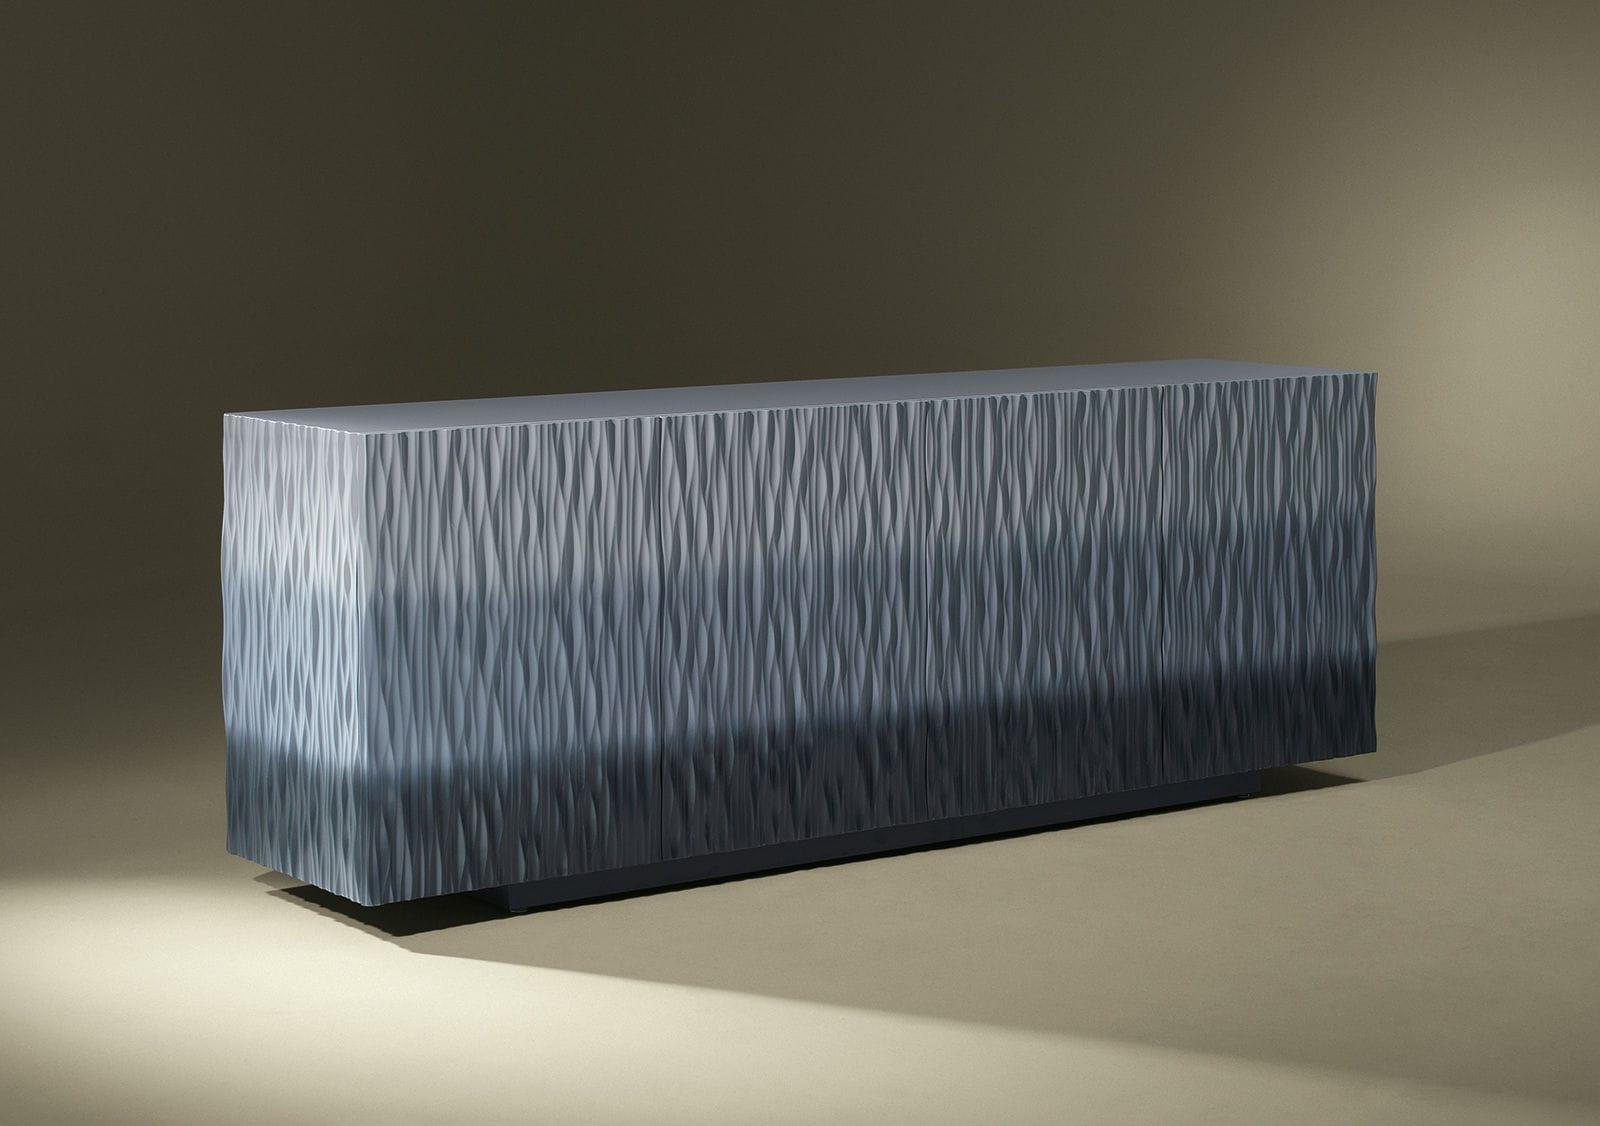 Buffet contemporain   en bois laqué   bleu   vert - MOON - Luisa ... e9a81be56d97